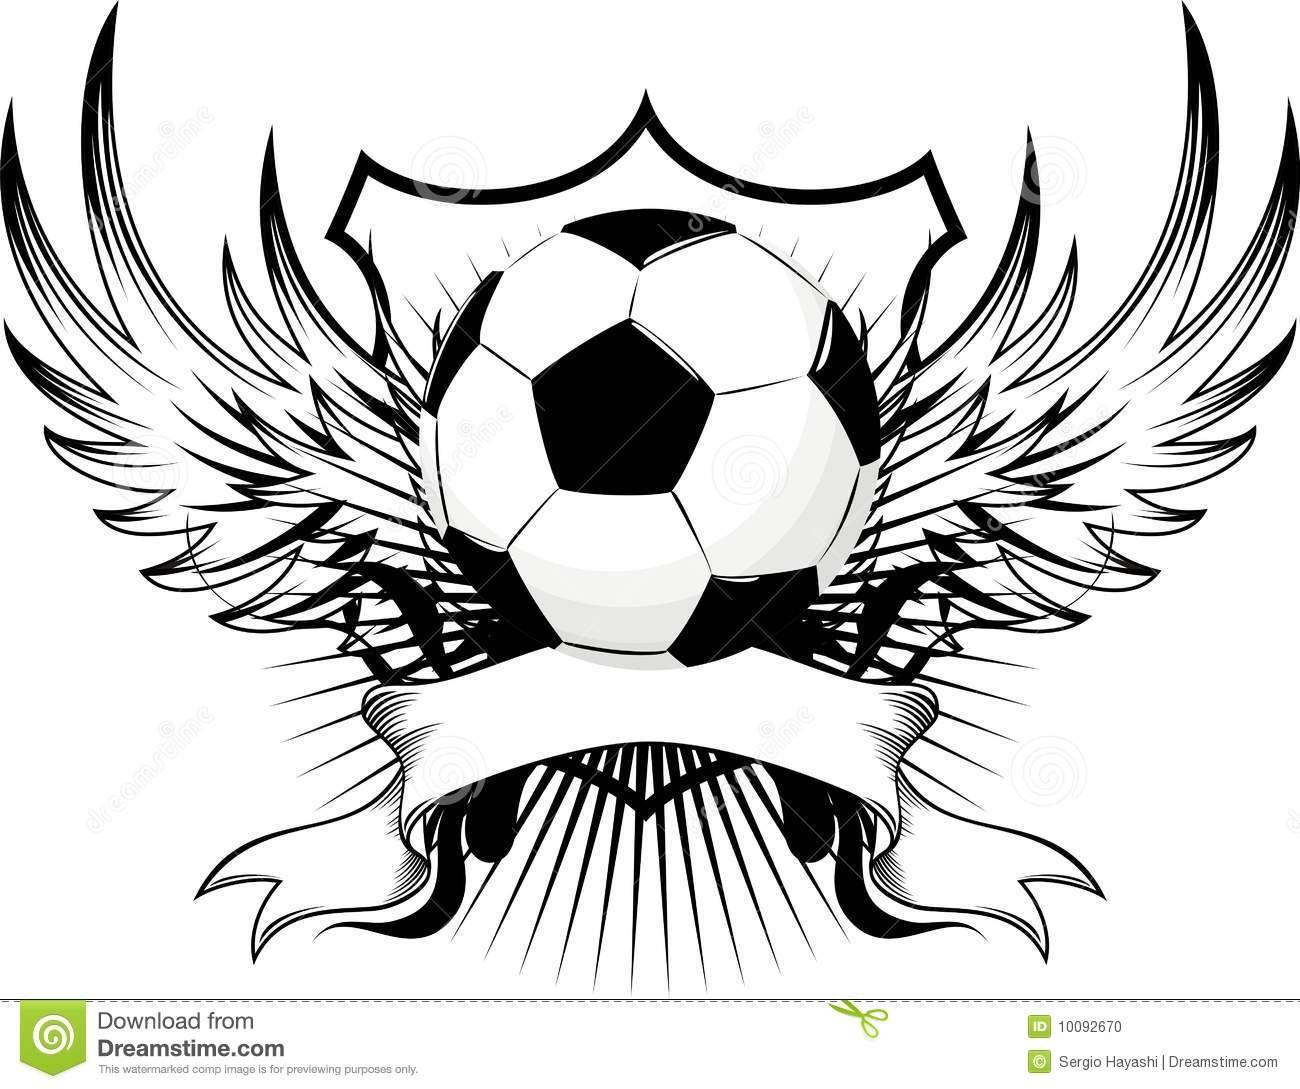 Resultado De Imagen Para Tatuajes De Balones De Futbol 3d Tatuaje